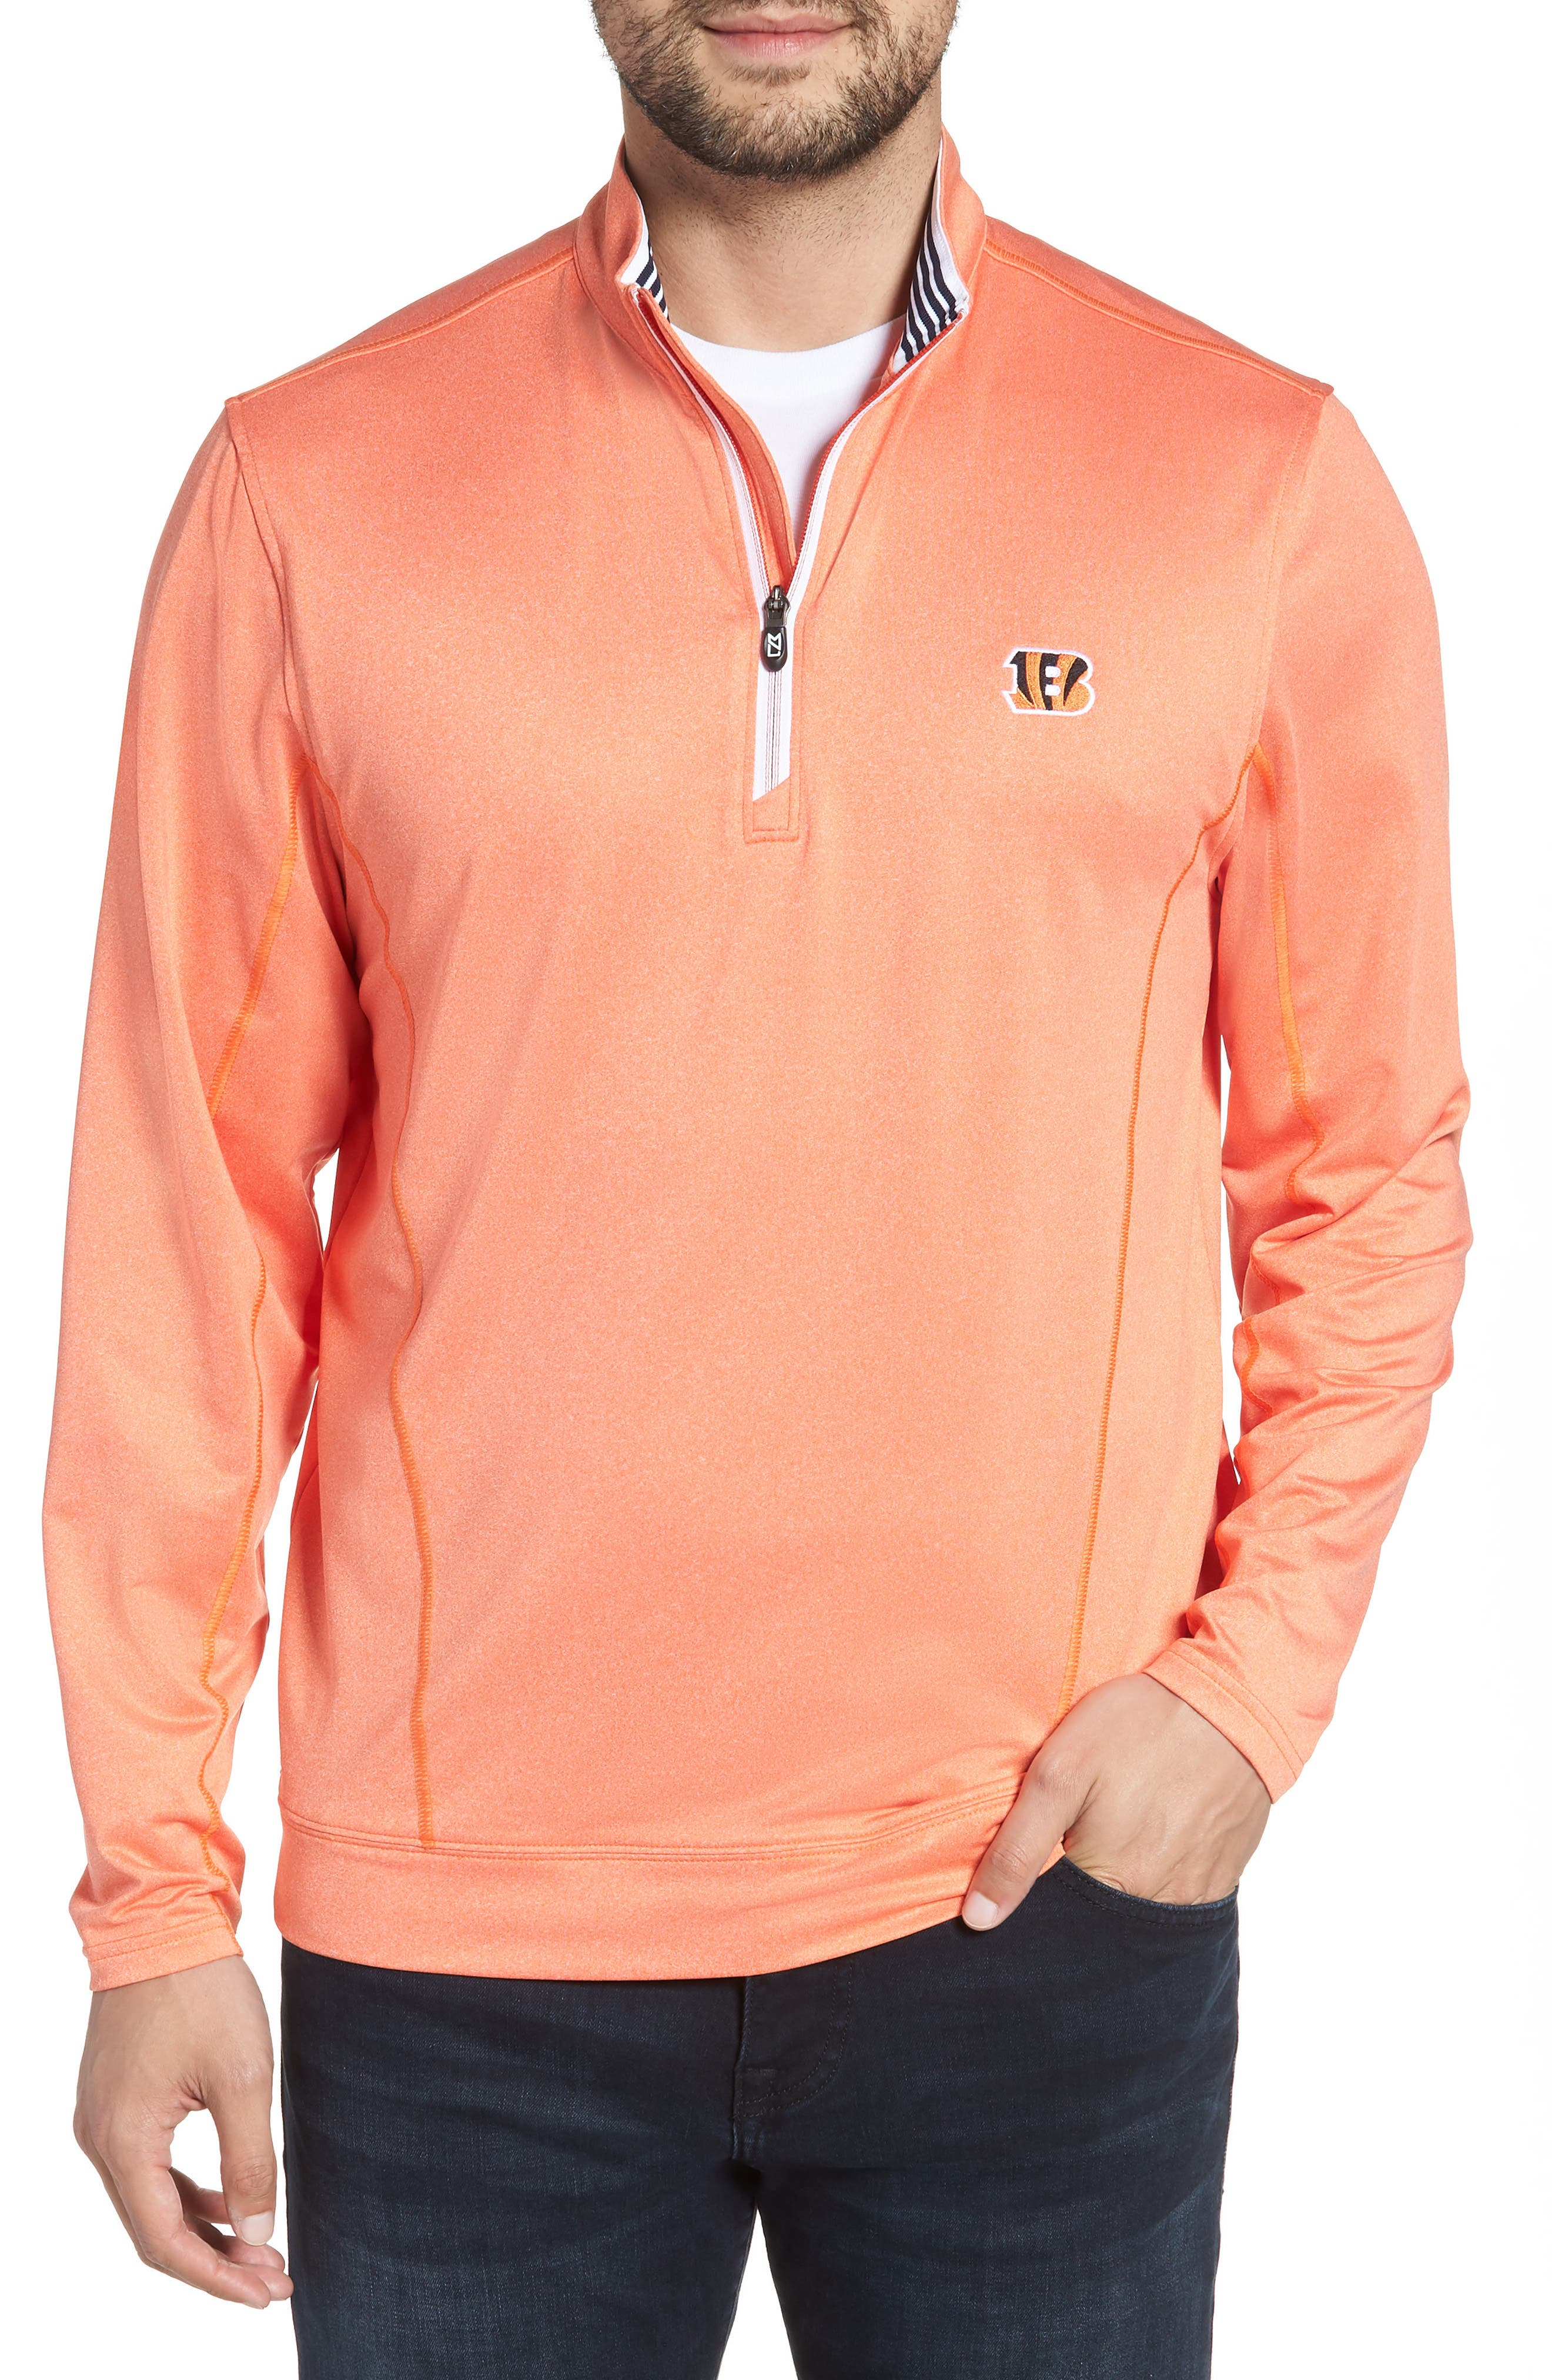 Endurance Cincinnati Bengals Regular Fit Pullover,                             Main thumbnail 1, color,                             COLLEGE ORANGE HEATHER